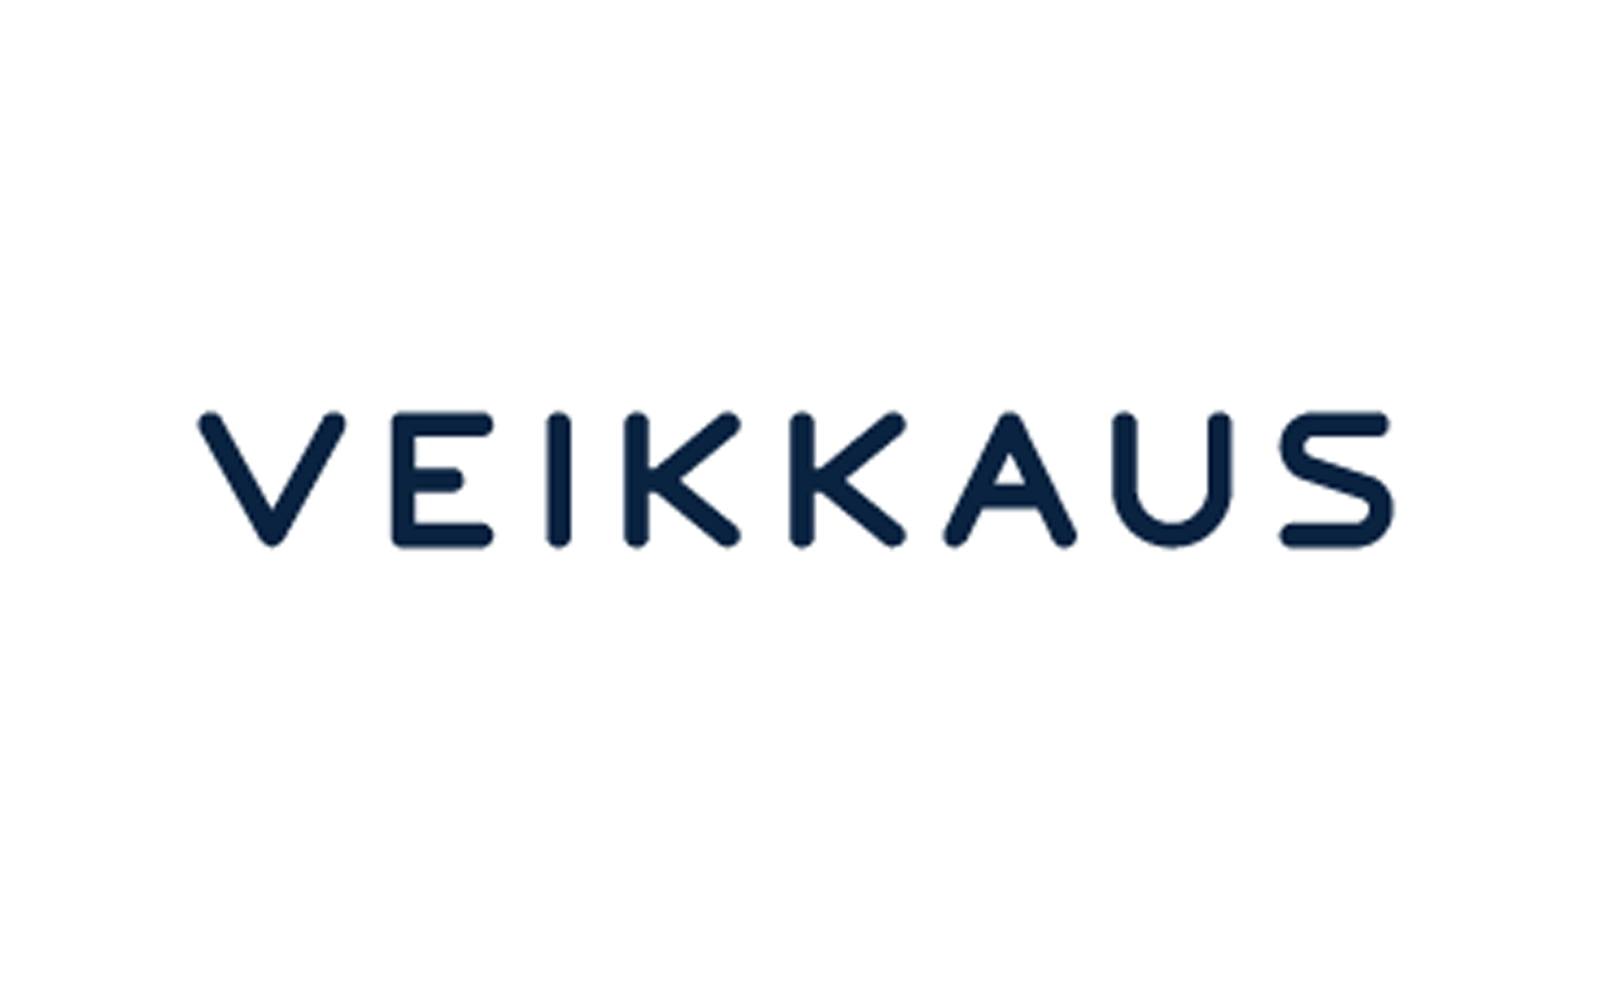 Finlands Veikkaus Negotiates Staff Layoffs As Pandemic Continues